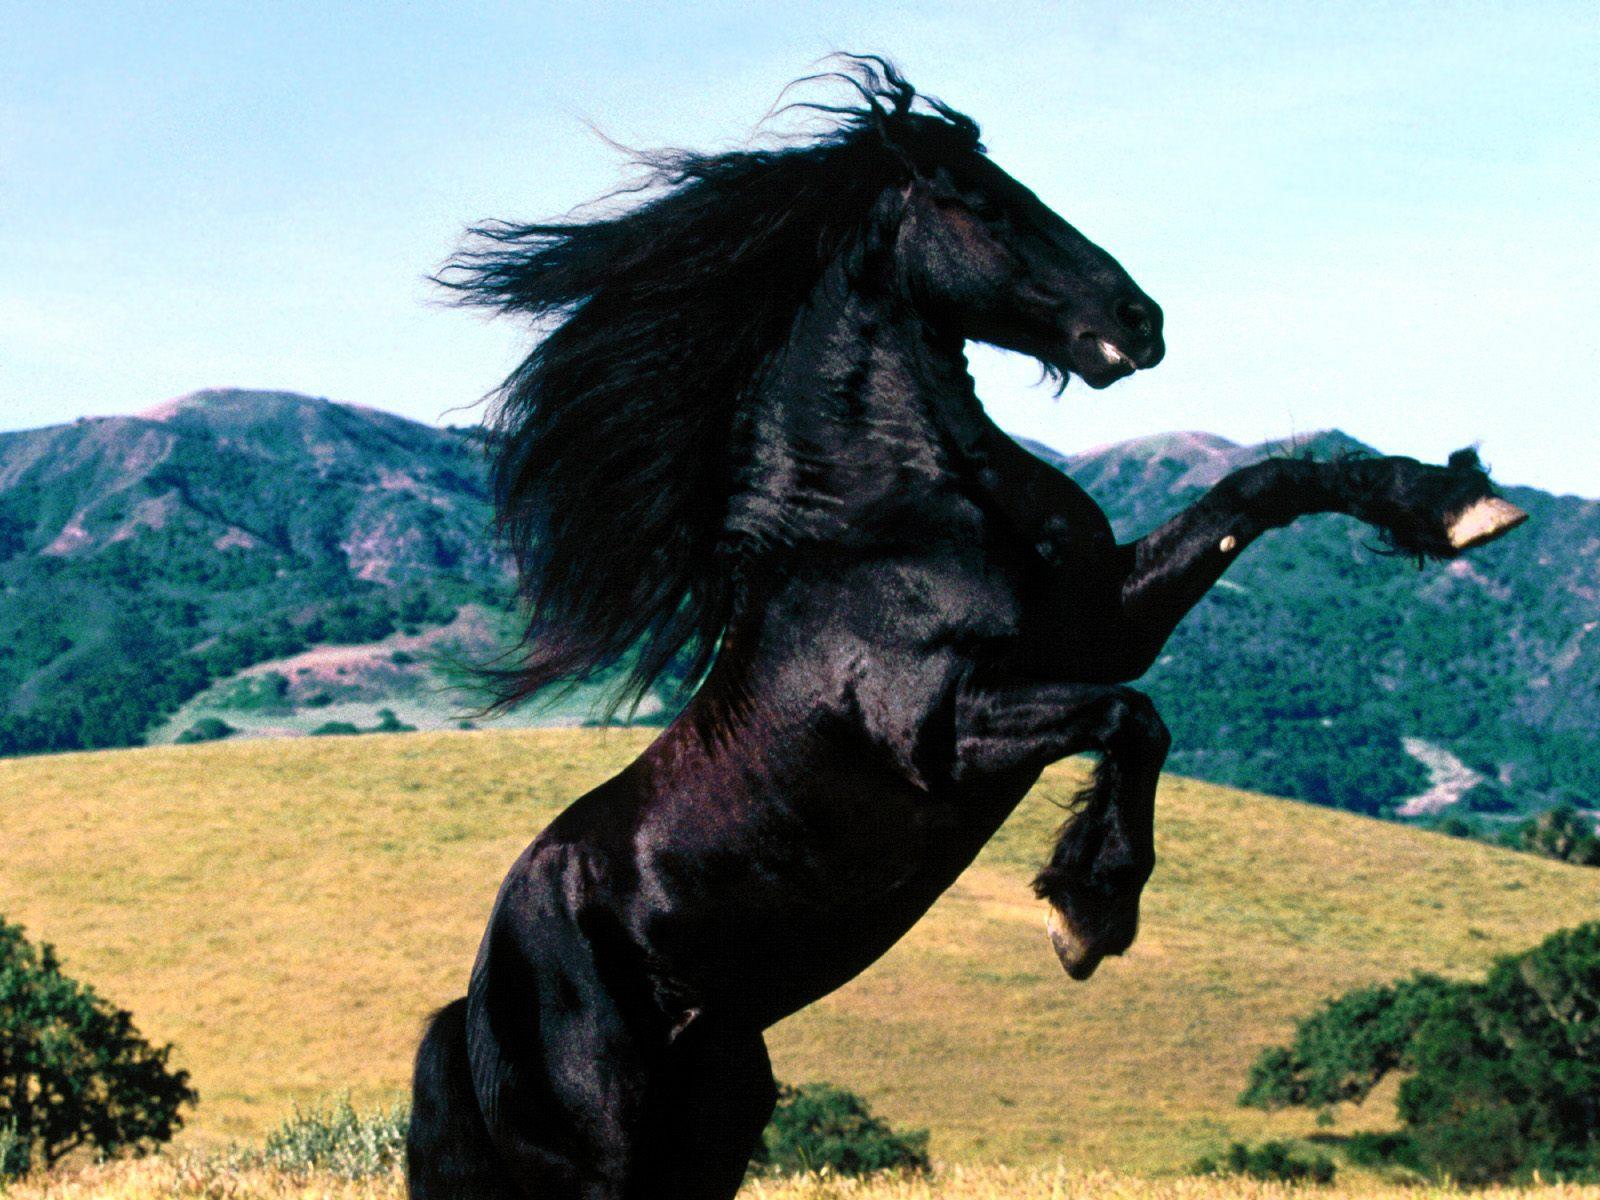 12 Black Horse Wallpapers  Black Horses Beautiful WallpapersBlack Horse Jumping